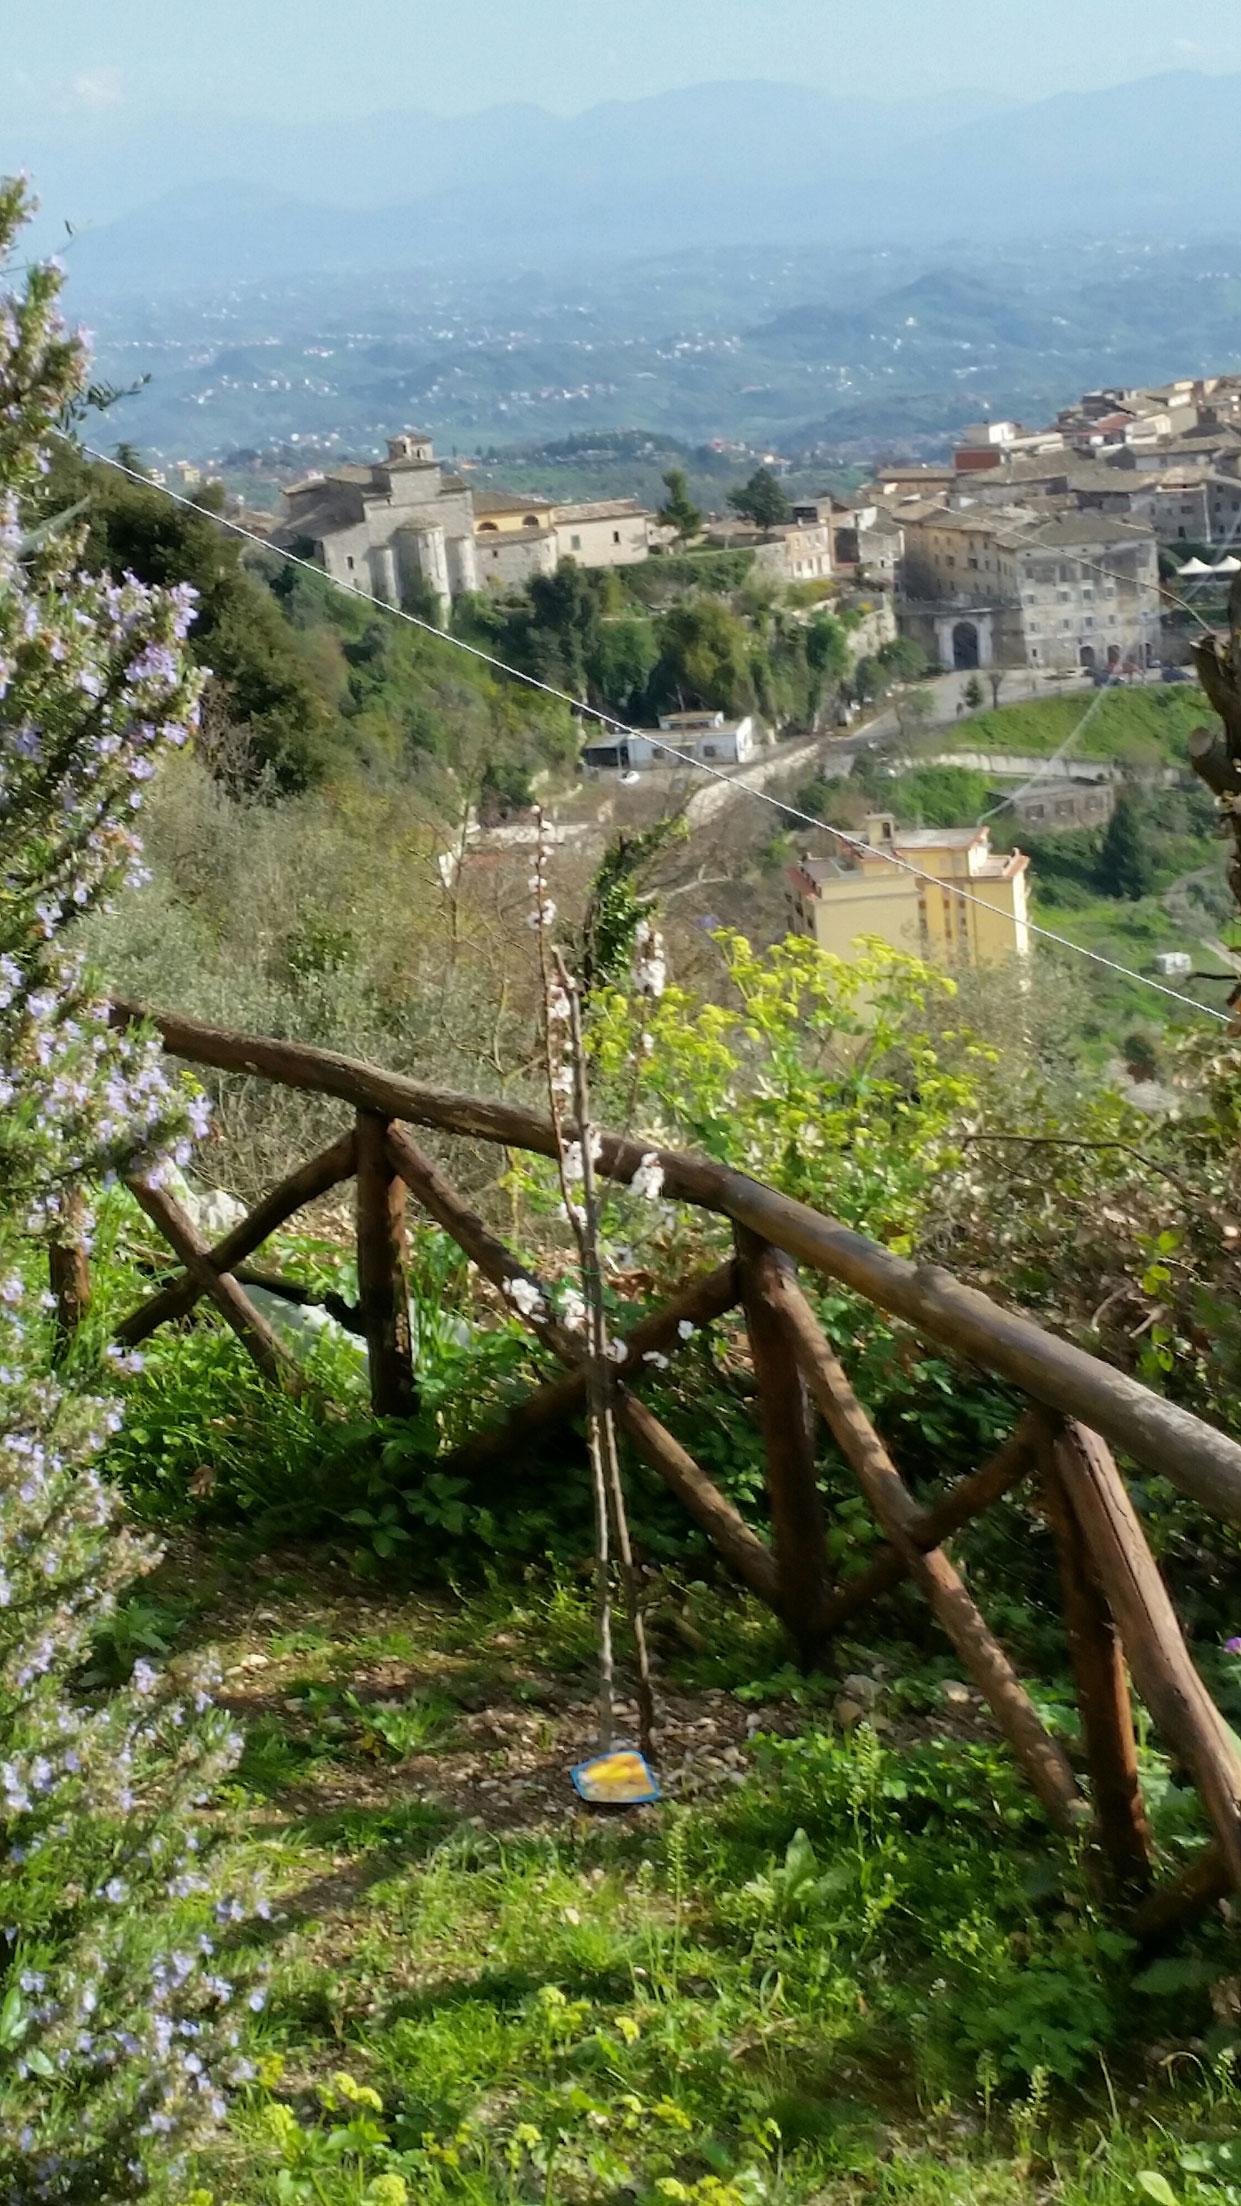 Frodig hage med trær og blomster